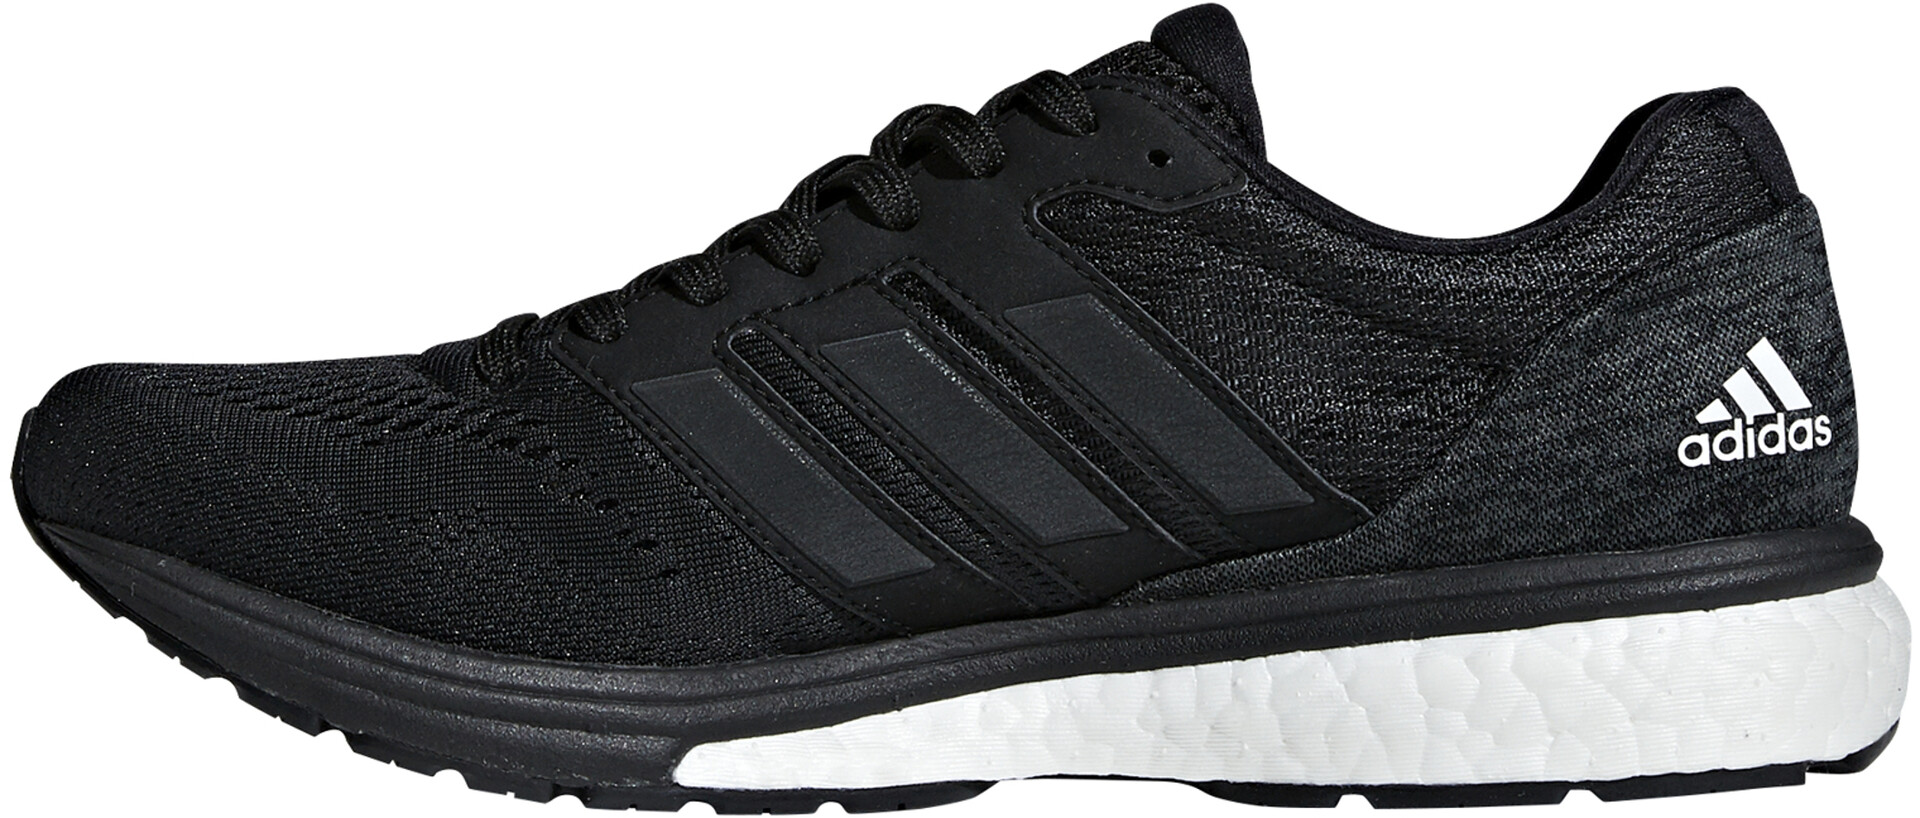 Boston Adidas Chaussures Running Noir De 7 Adizero Boutique 8OvmN0nw